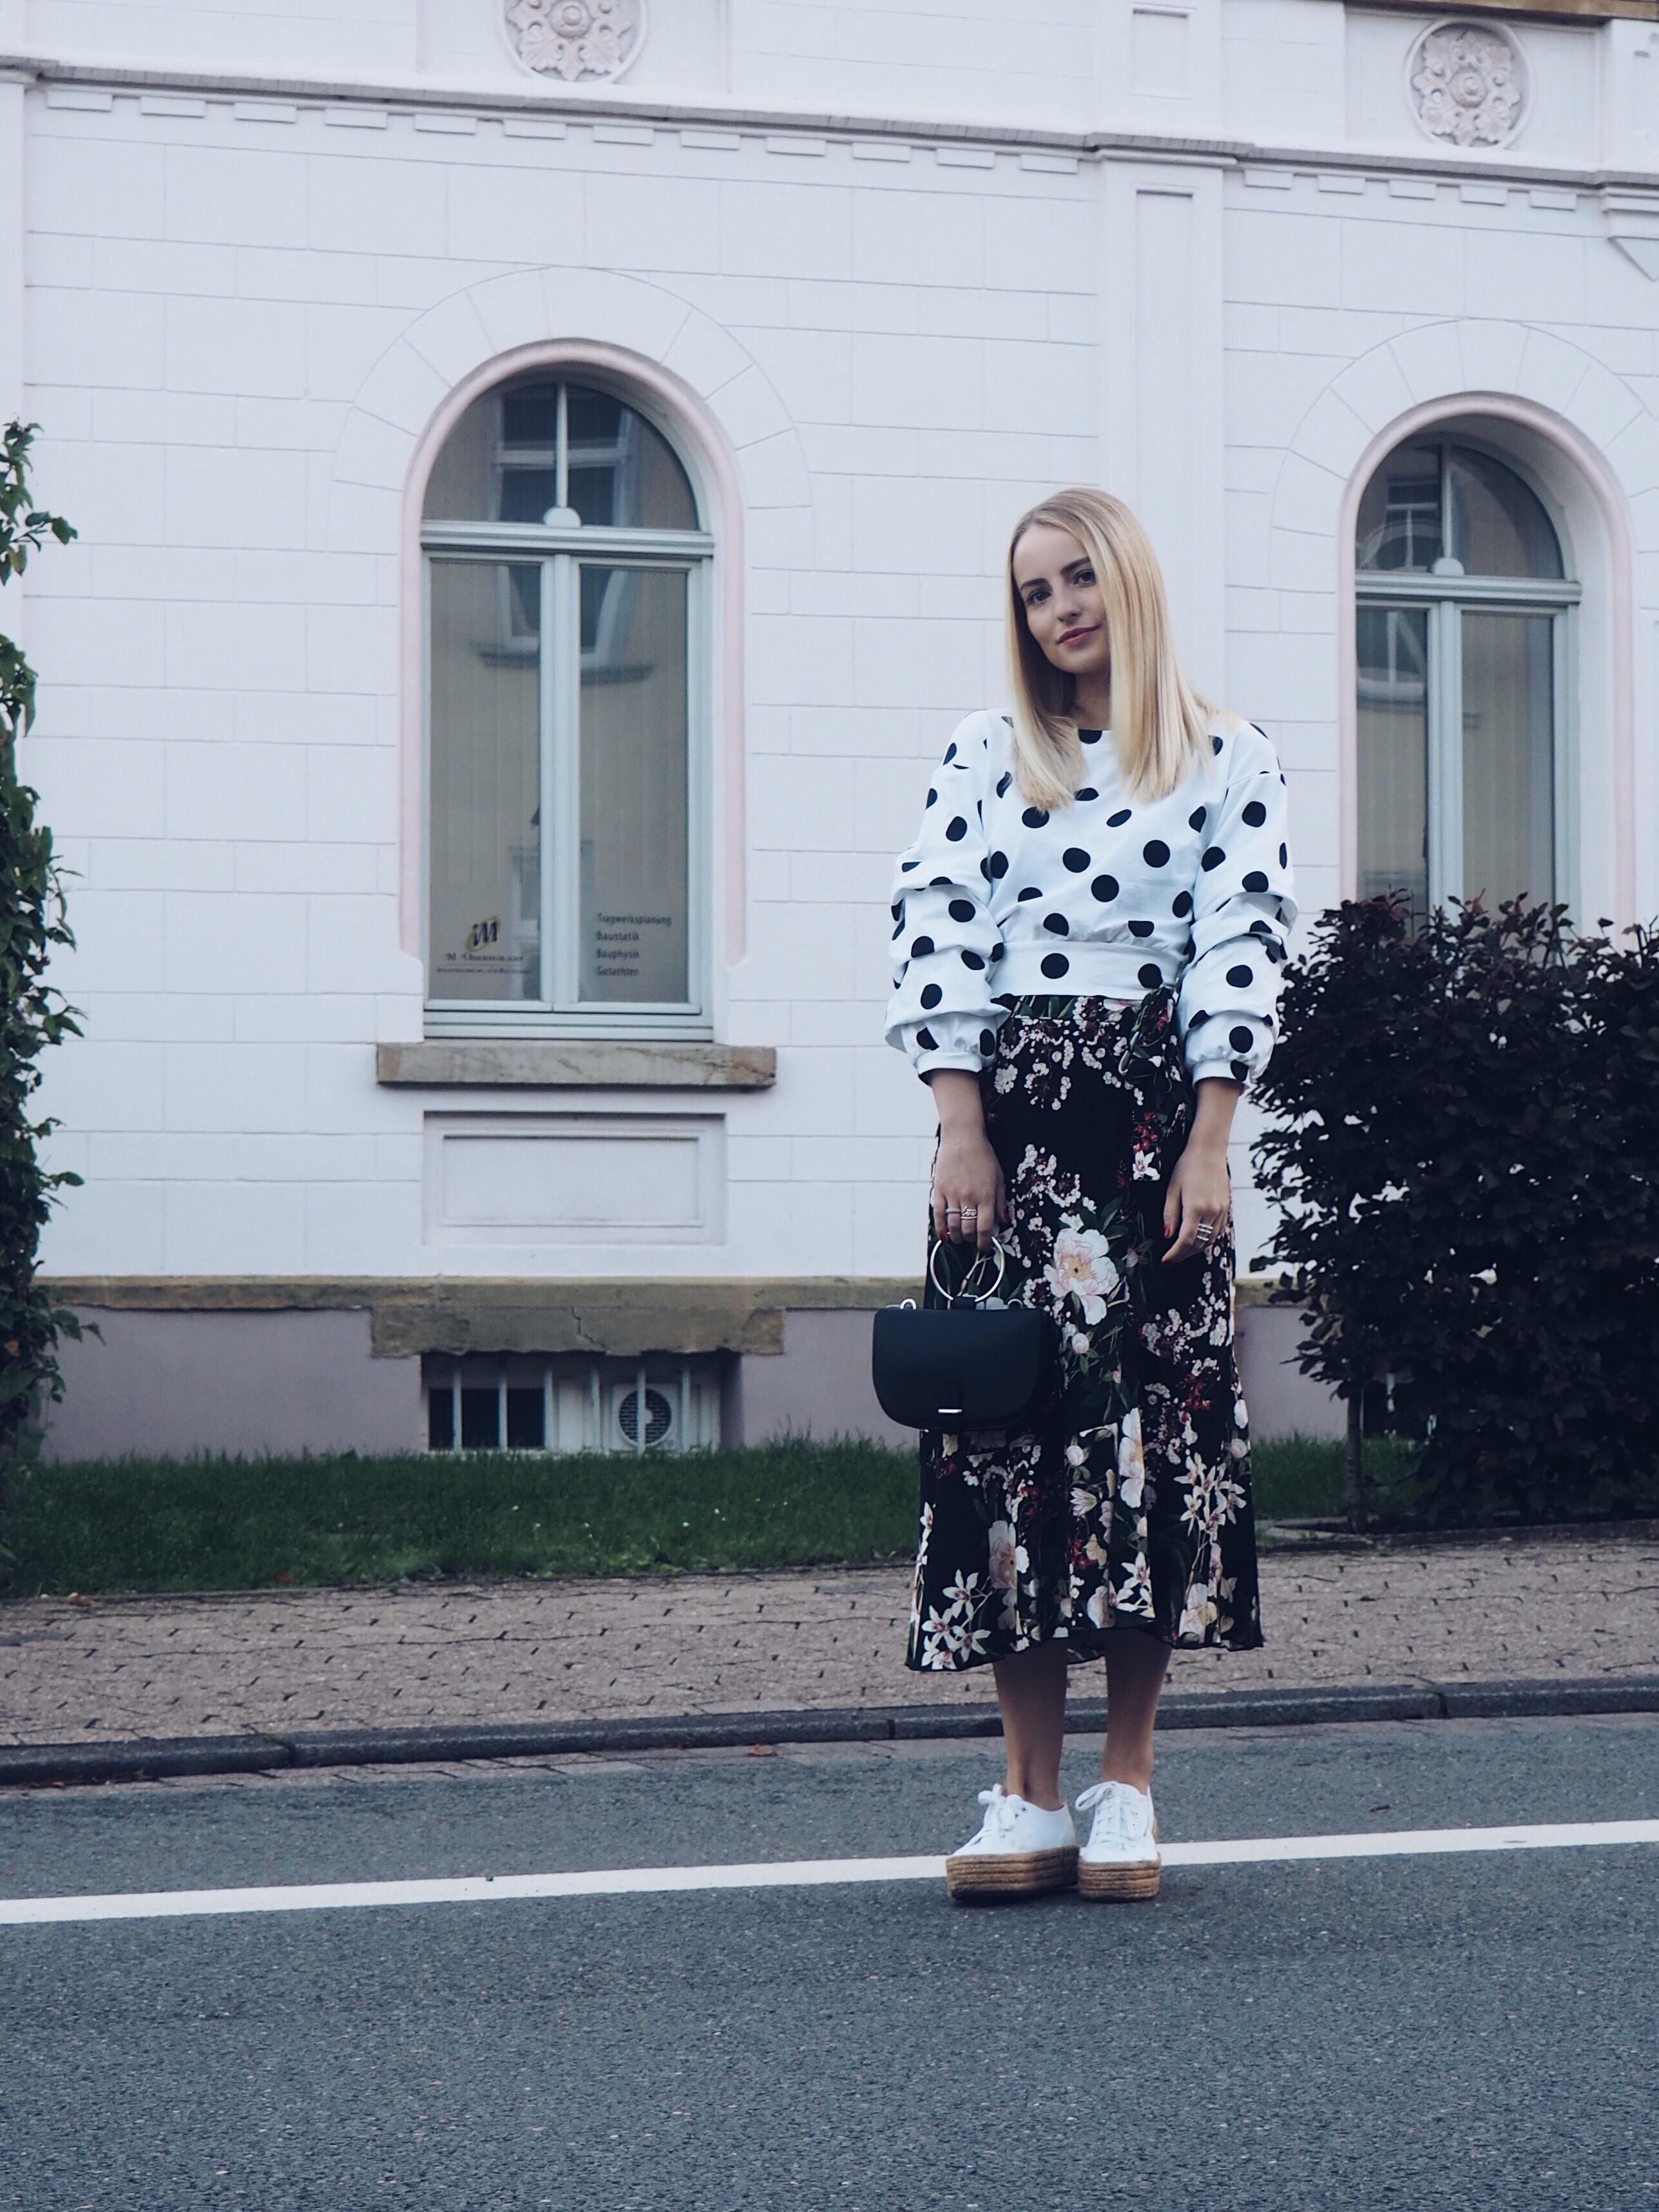 Trendreport: Polka Dots - KIM ENGEL